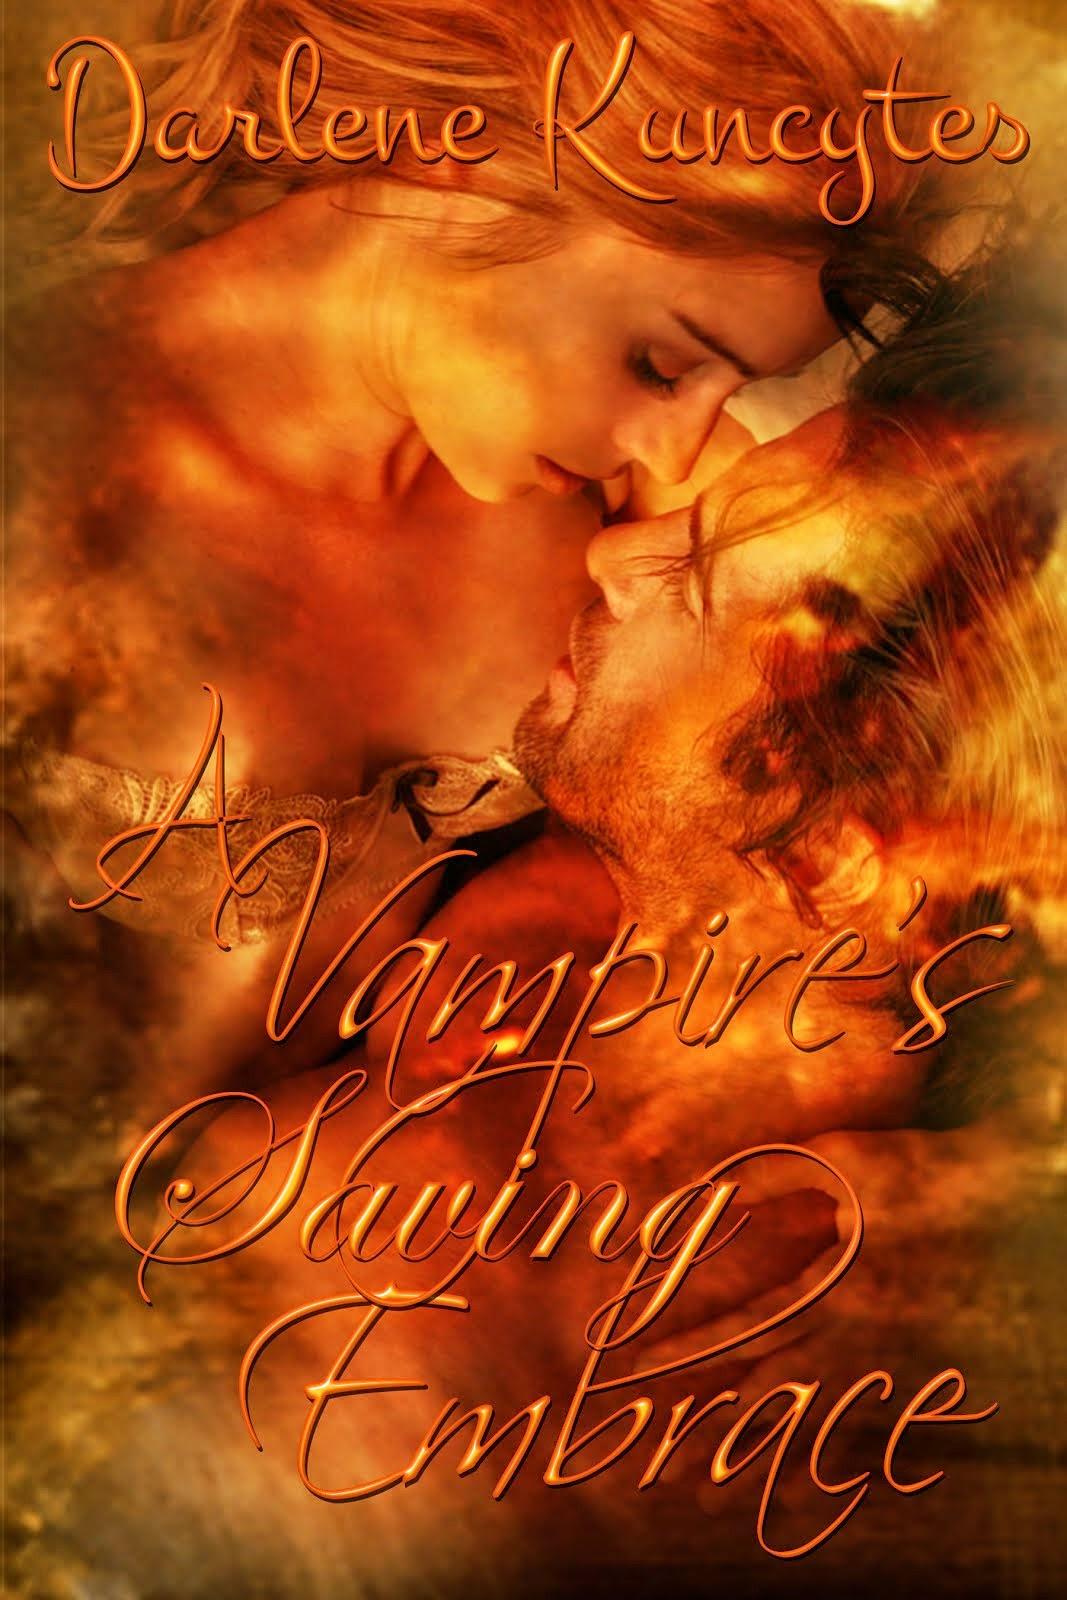 A Vampire's Saving Embrace